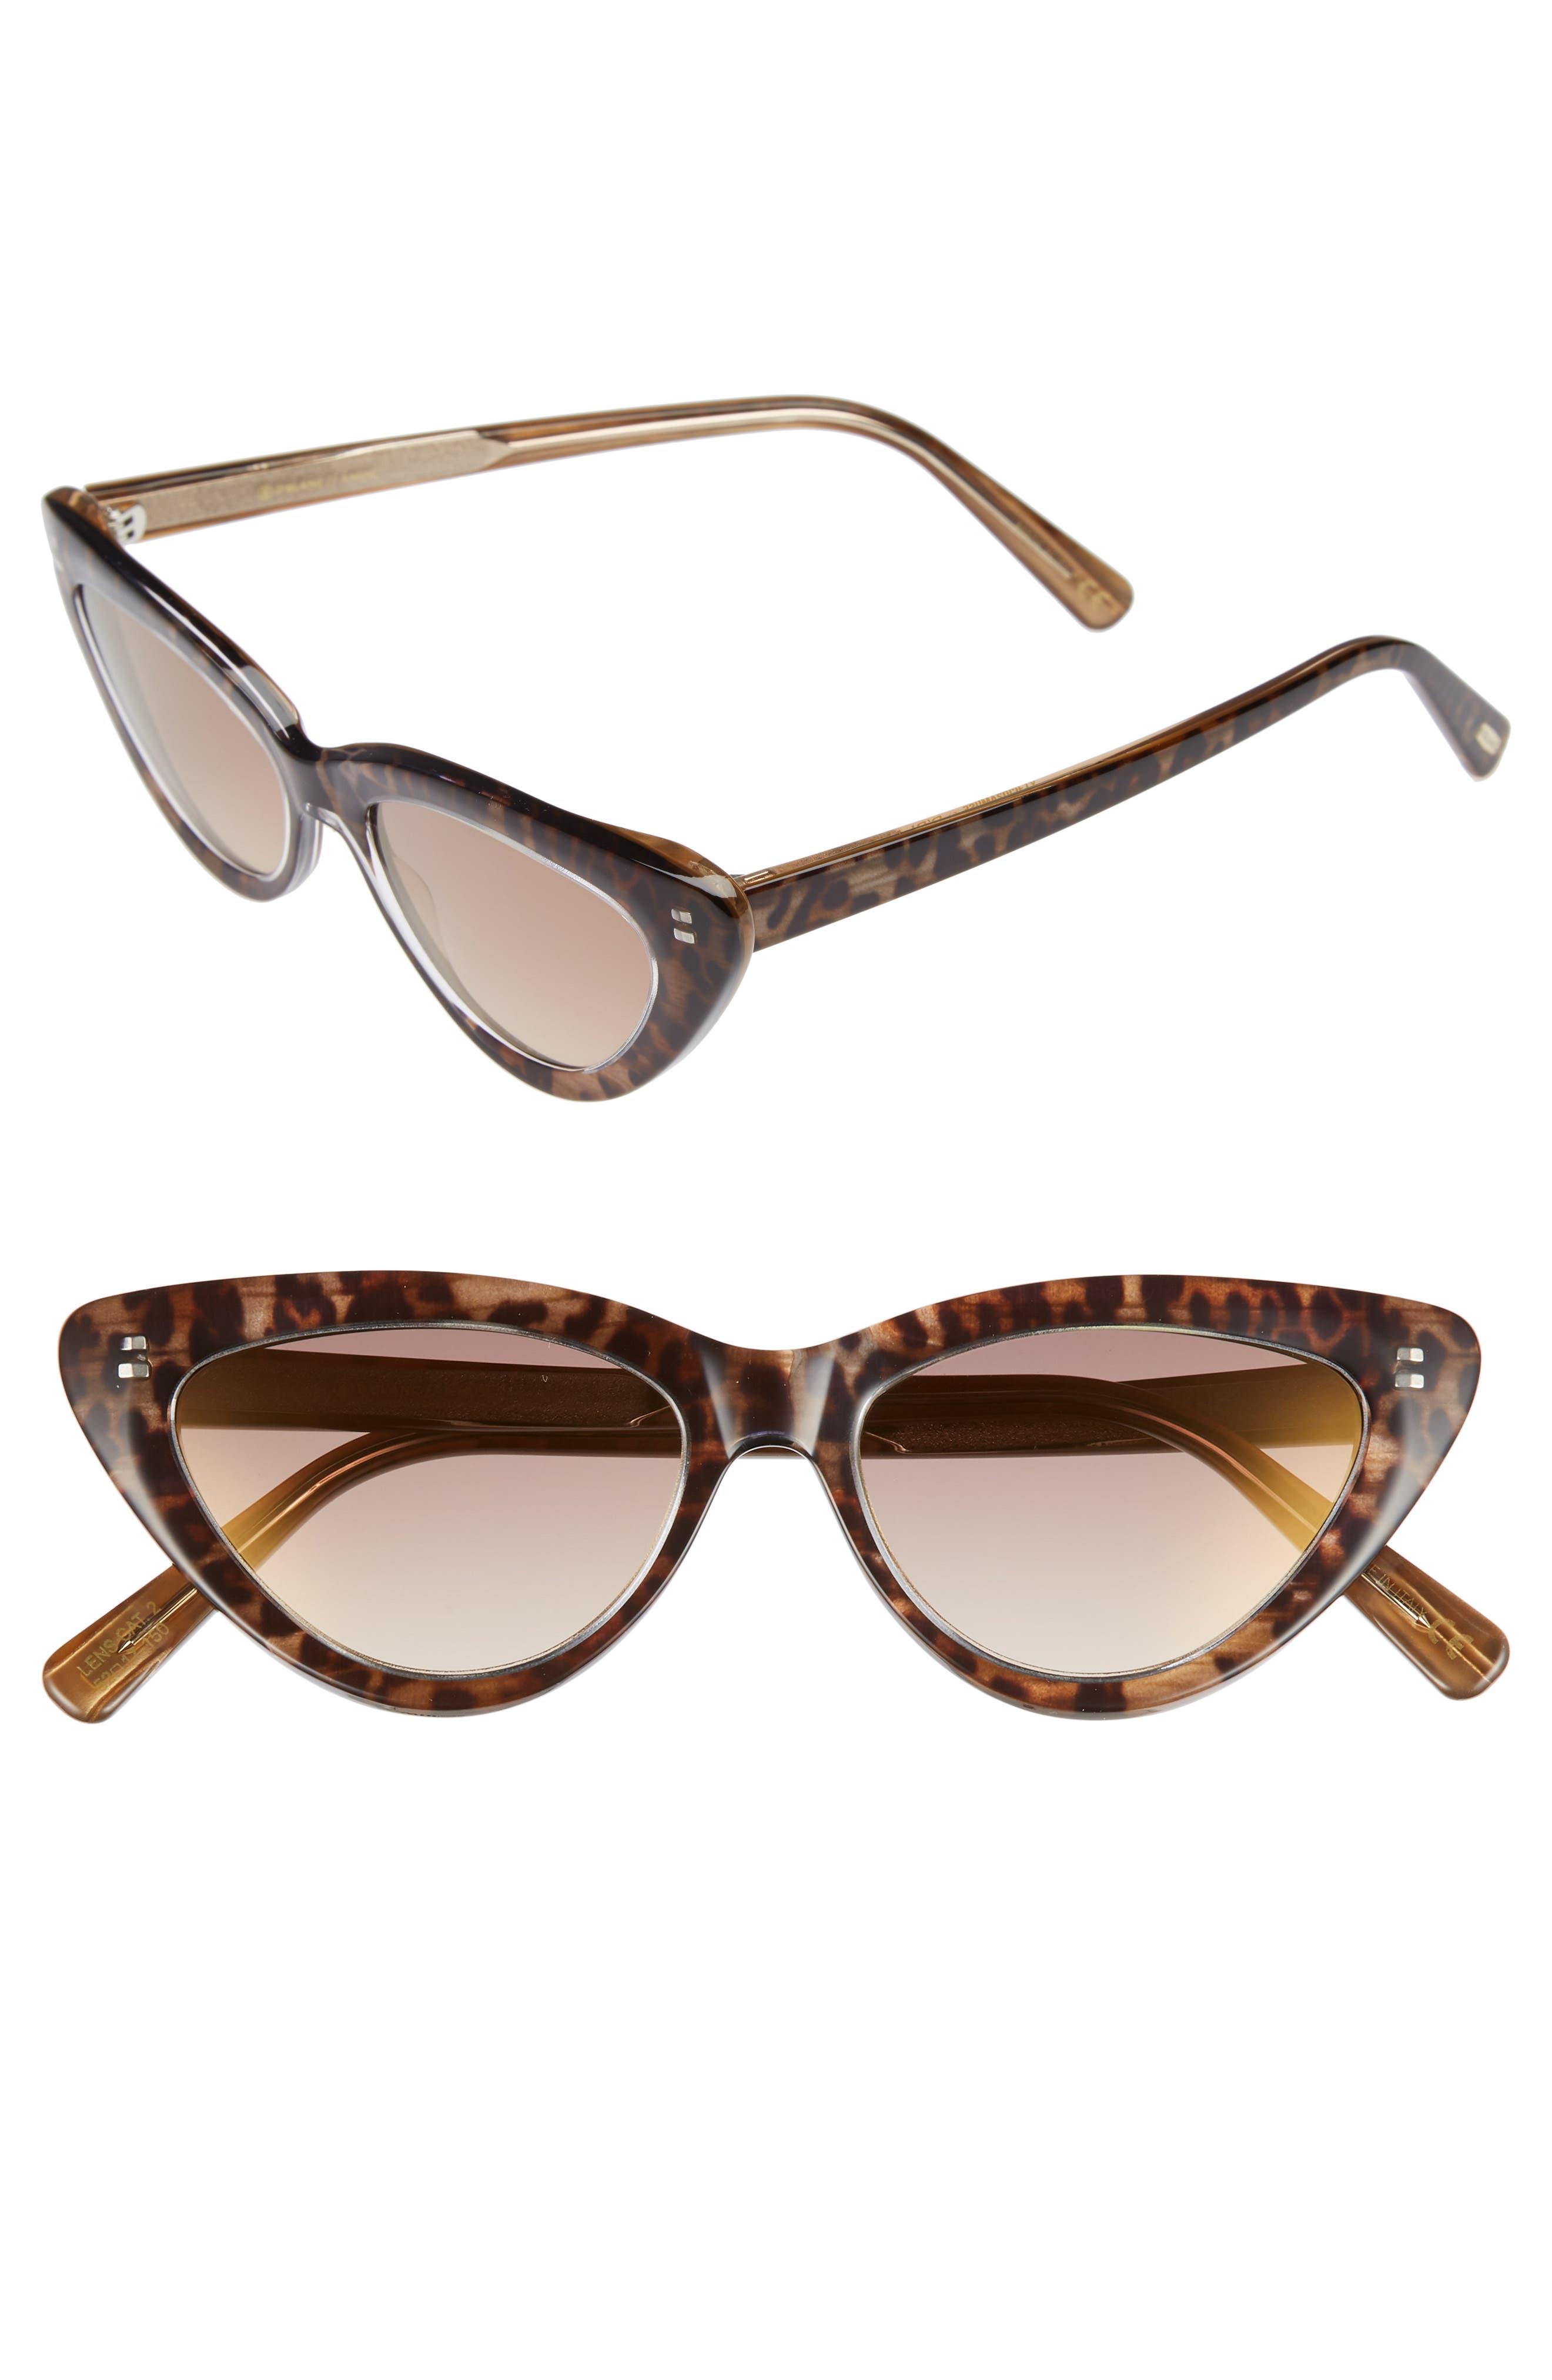 D'BLANC A-Muse 52mm Sunglasses,                         Main,                         color, Cheetah